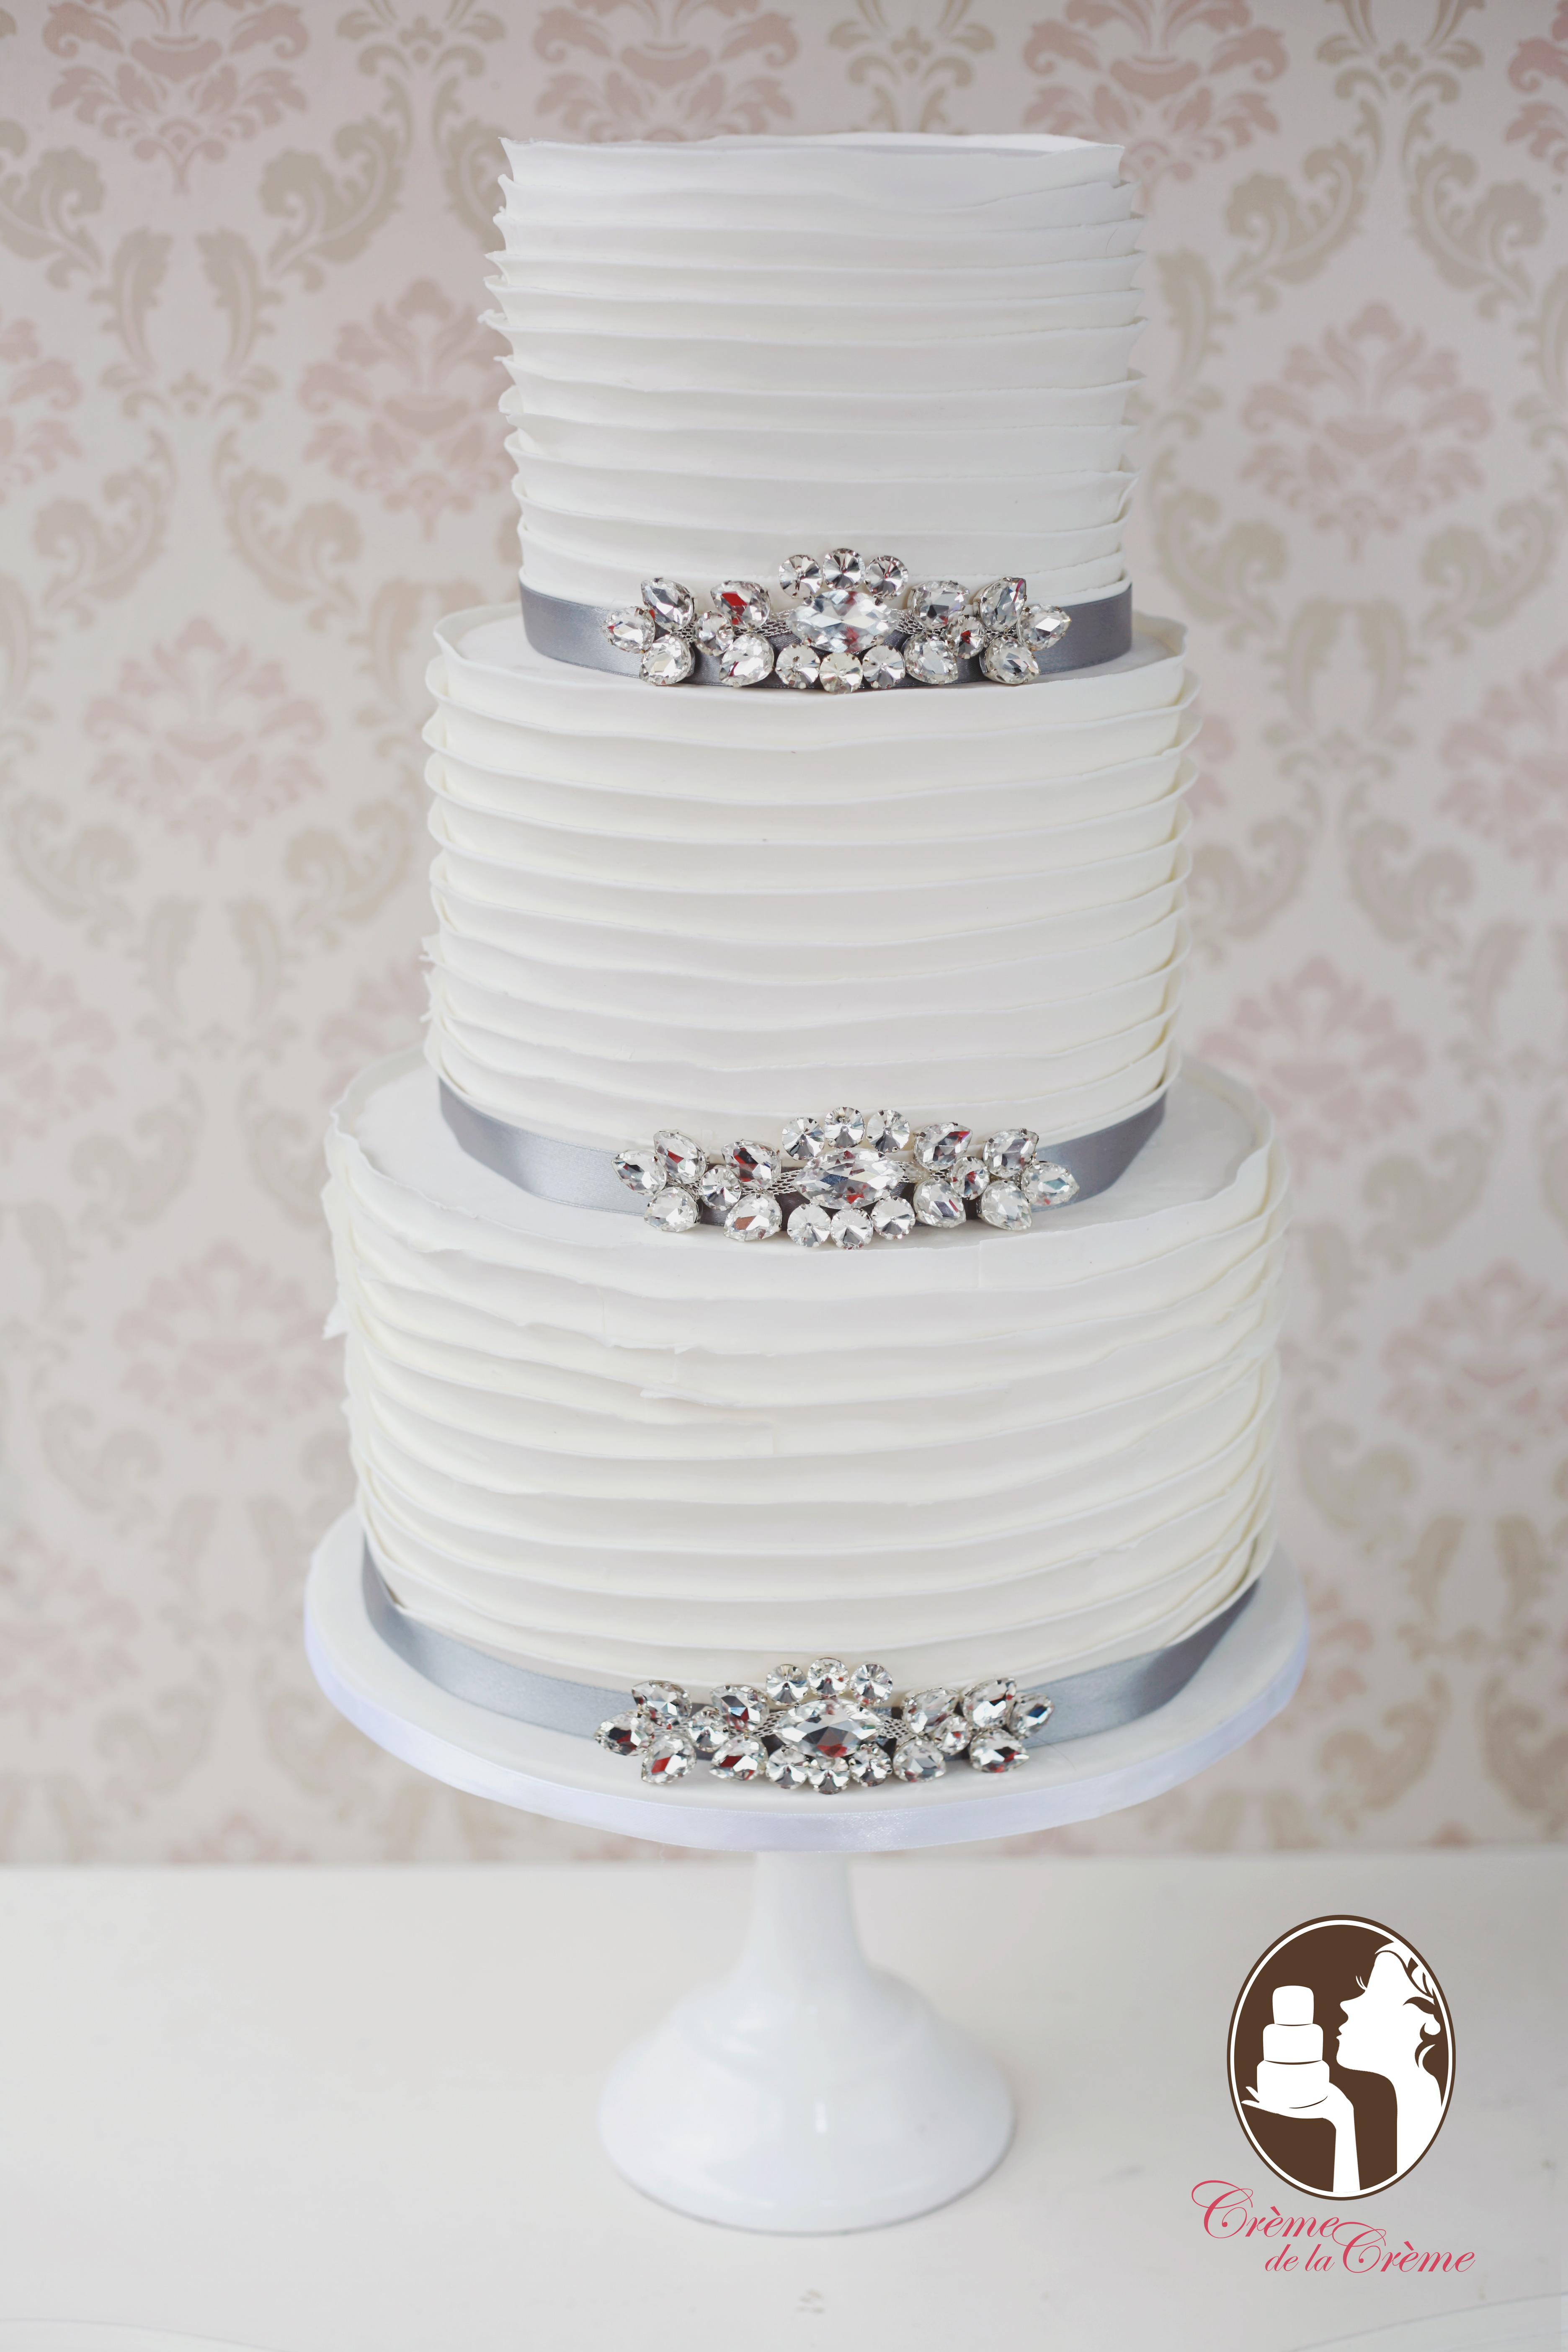 White Ruffle Wedding Cake by Creme de la Creme Bali   Bridestory.com